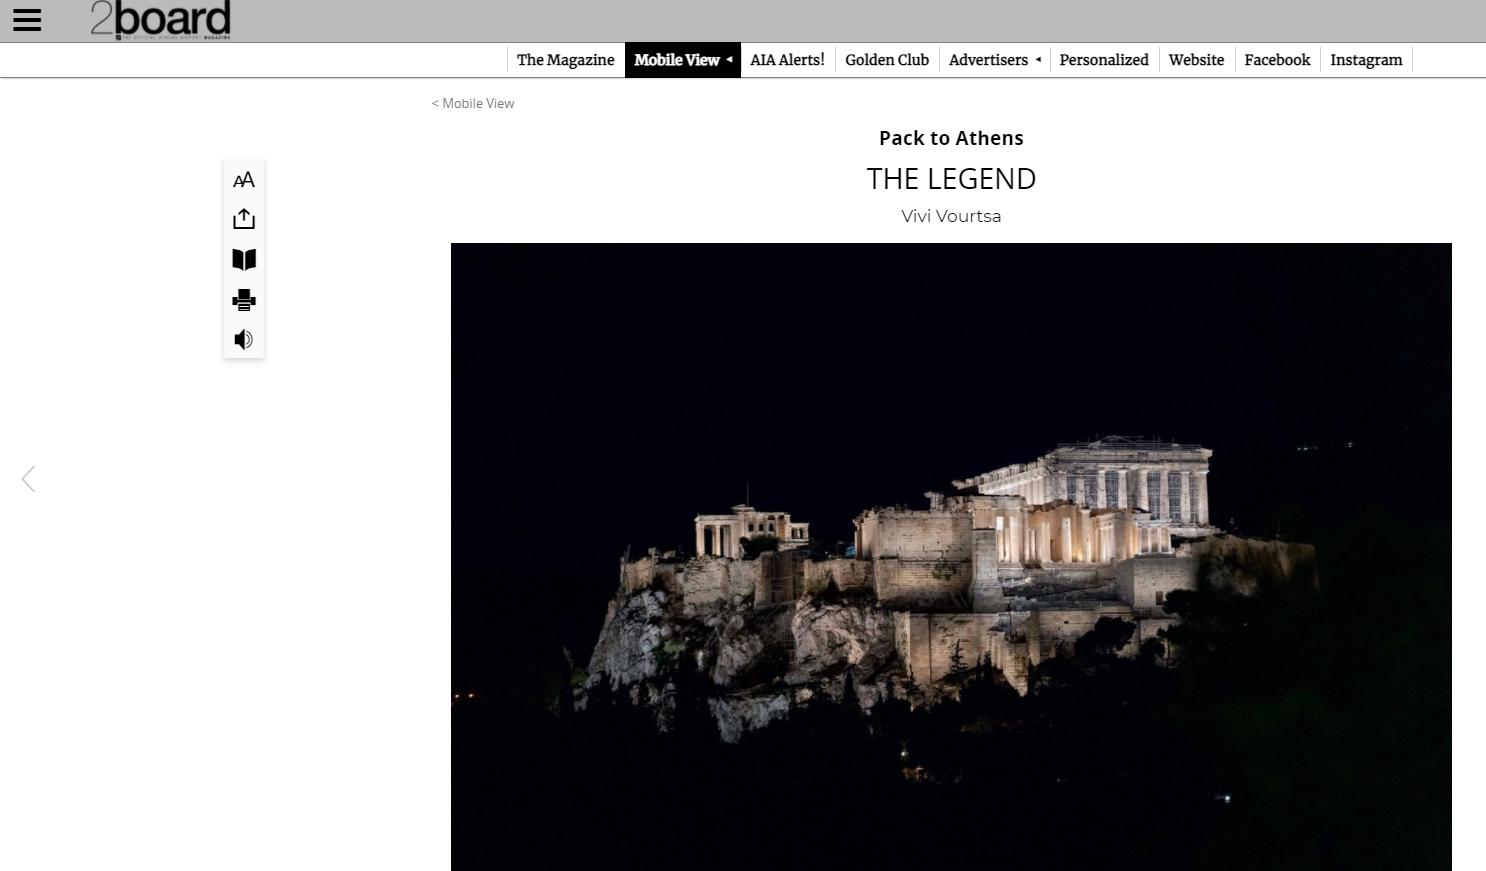 2board press Acropolis of Athens